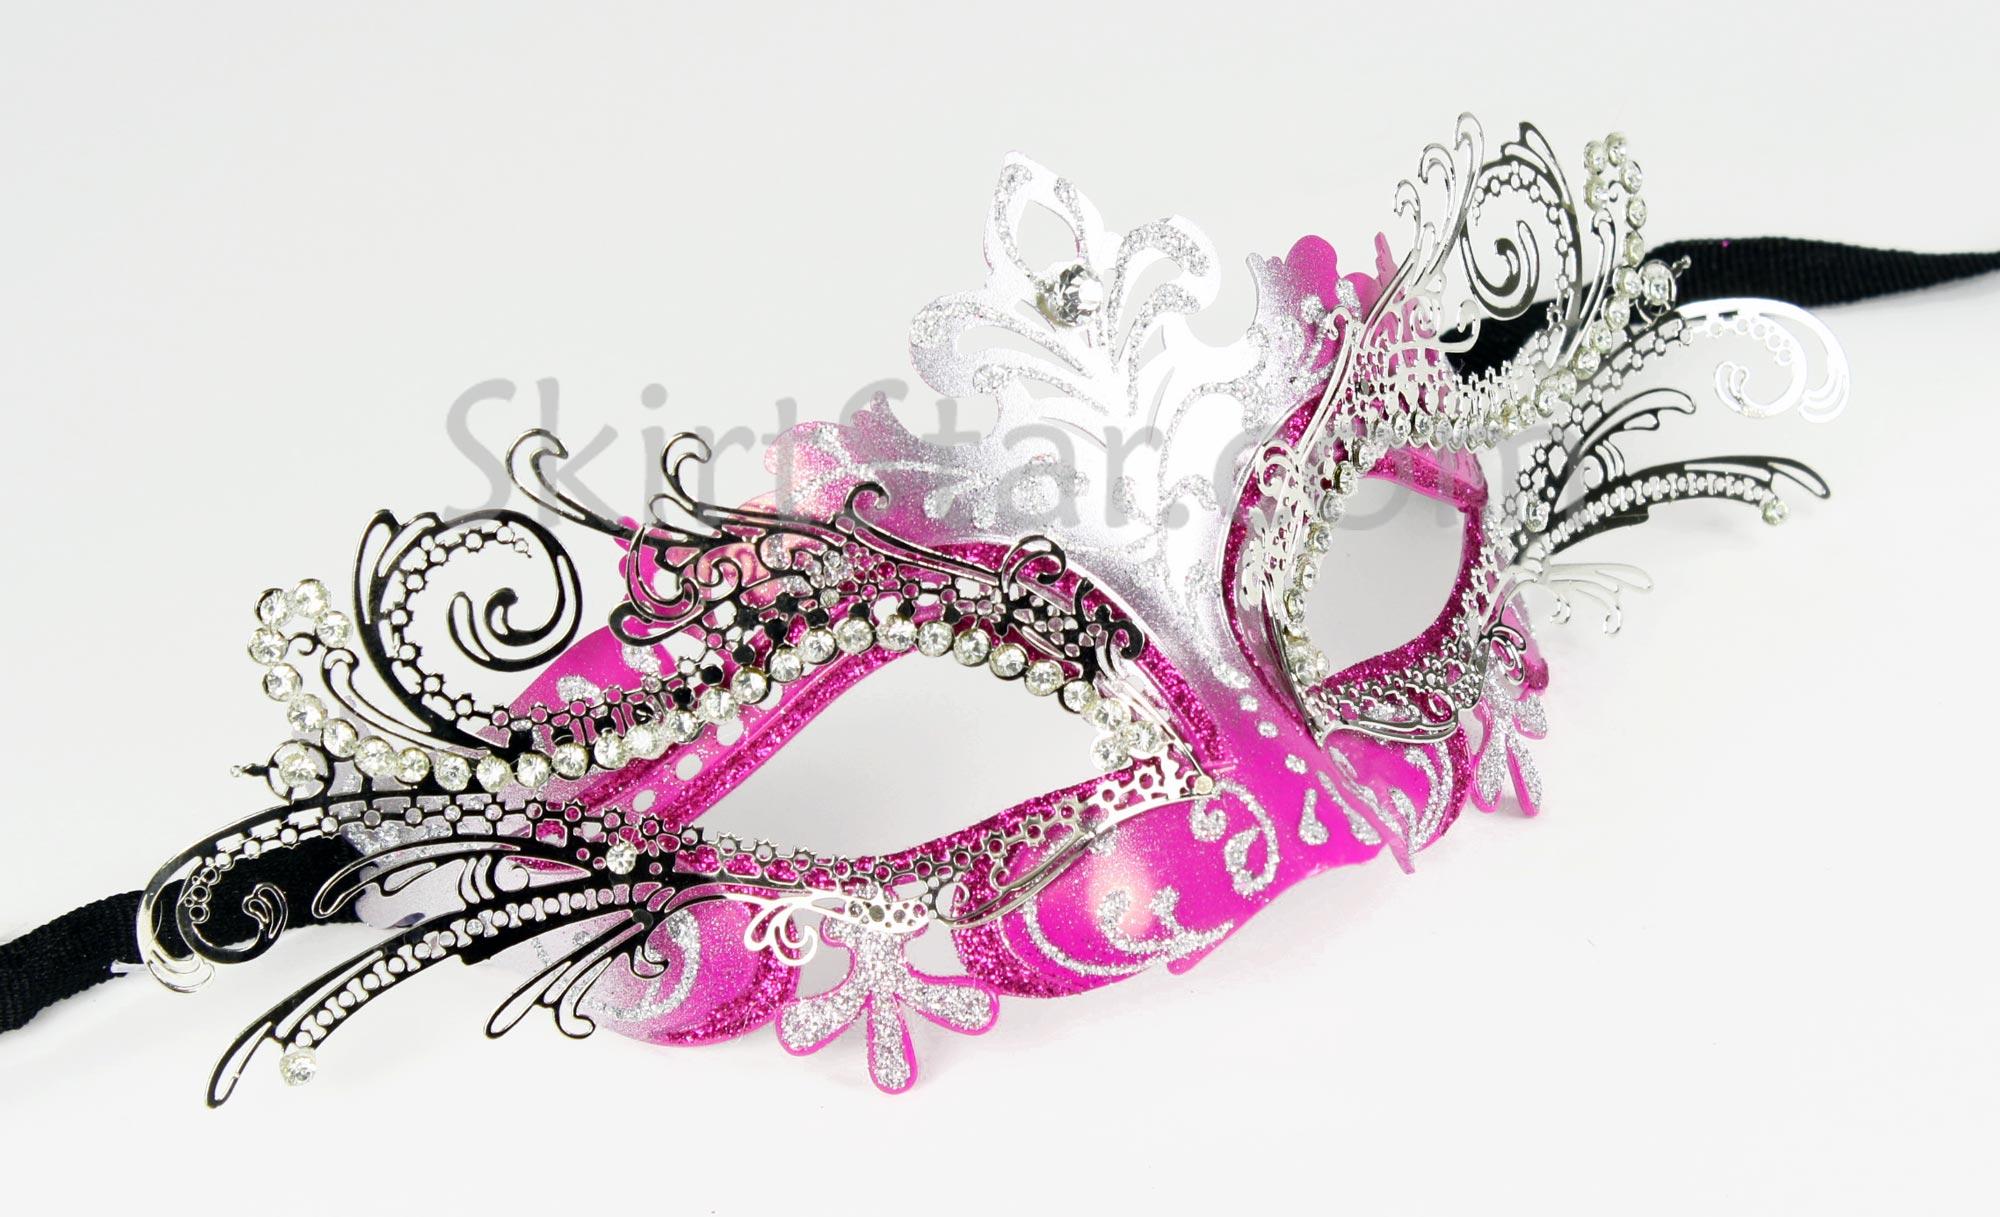 Beautiful Masquerade Ball Masks Mymasqueradeballmaskscom 2015 ...